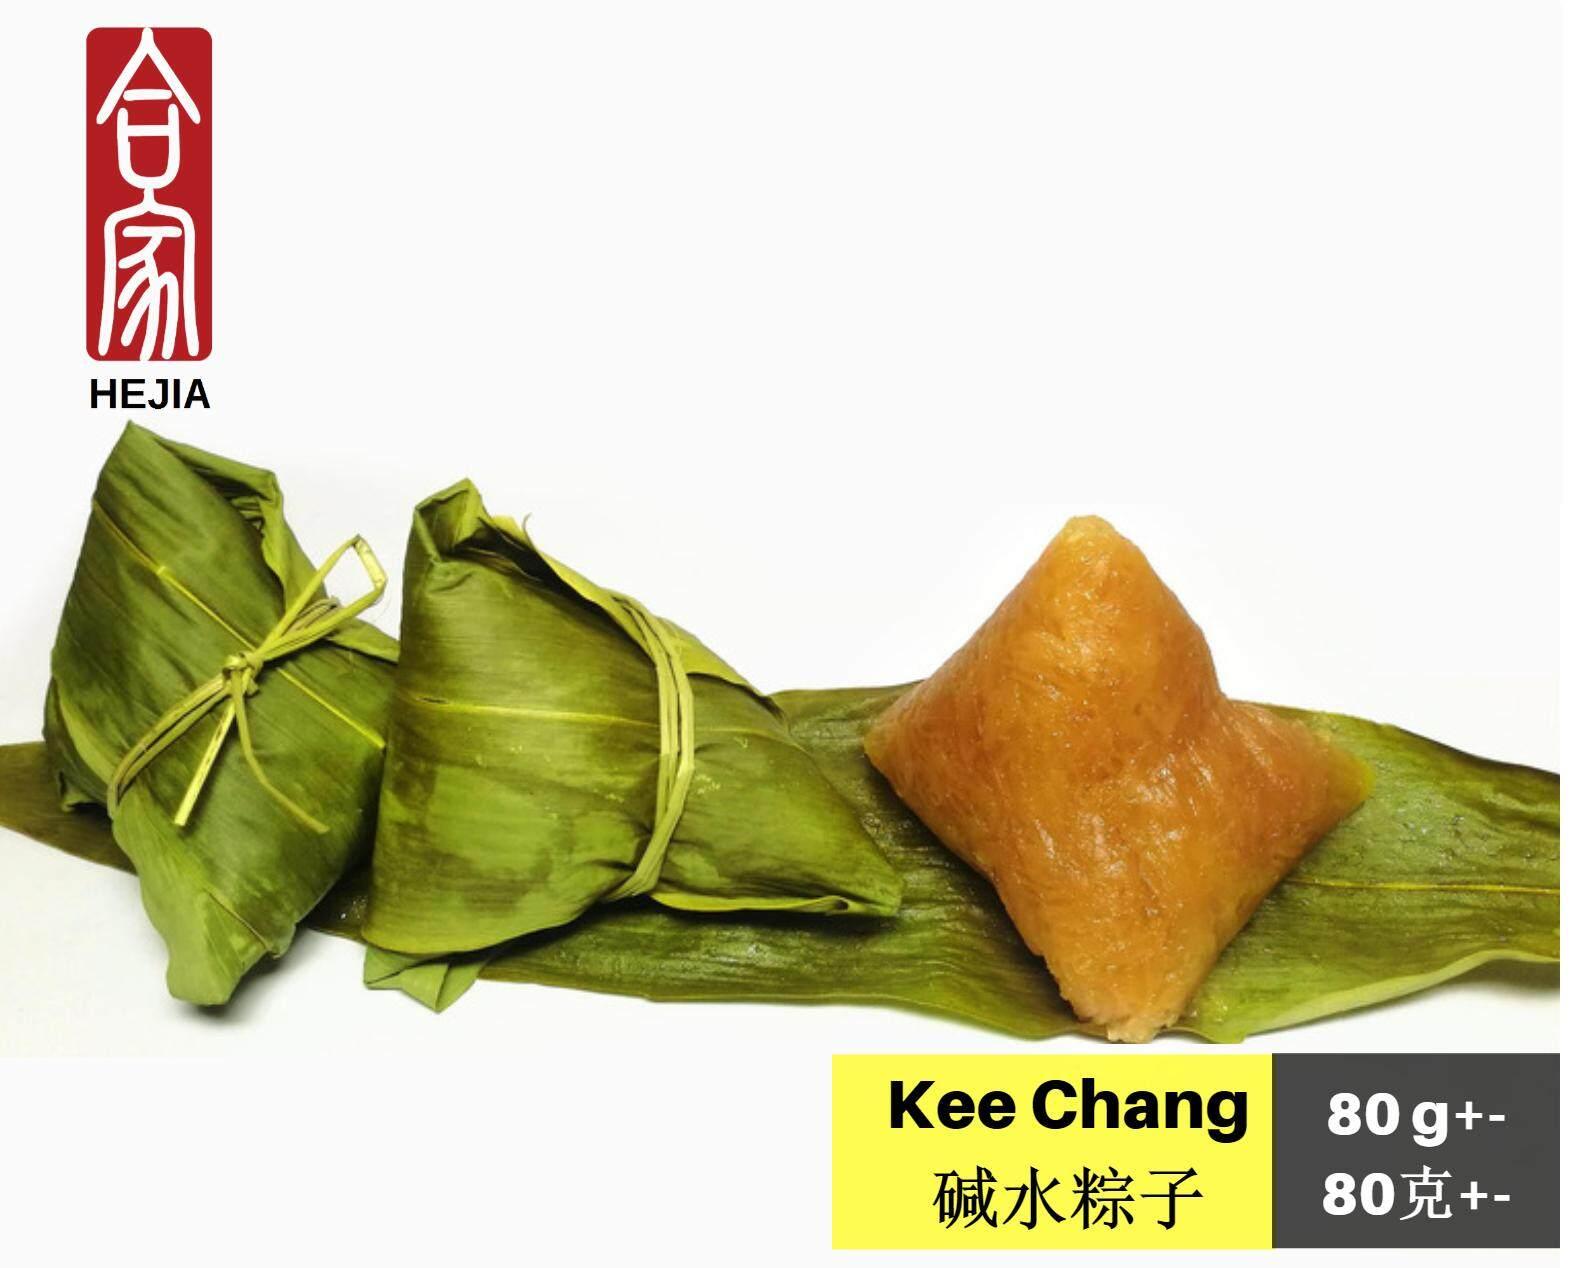 HEJIA Kee Chang Rice Dumpling [Vacuum Pack ]